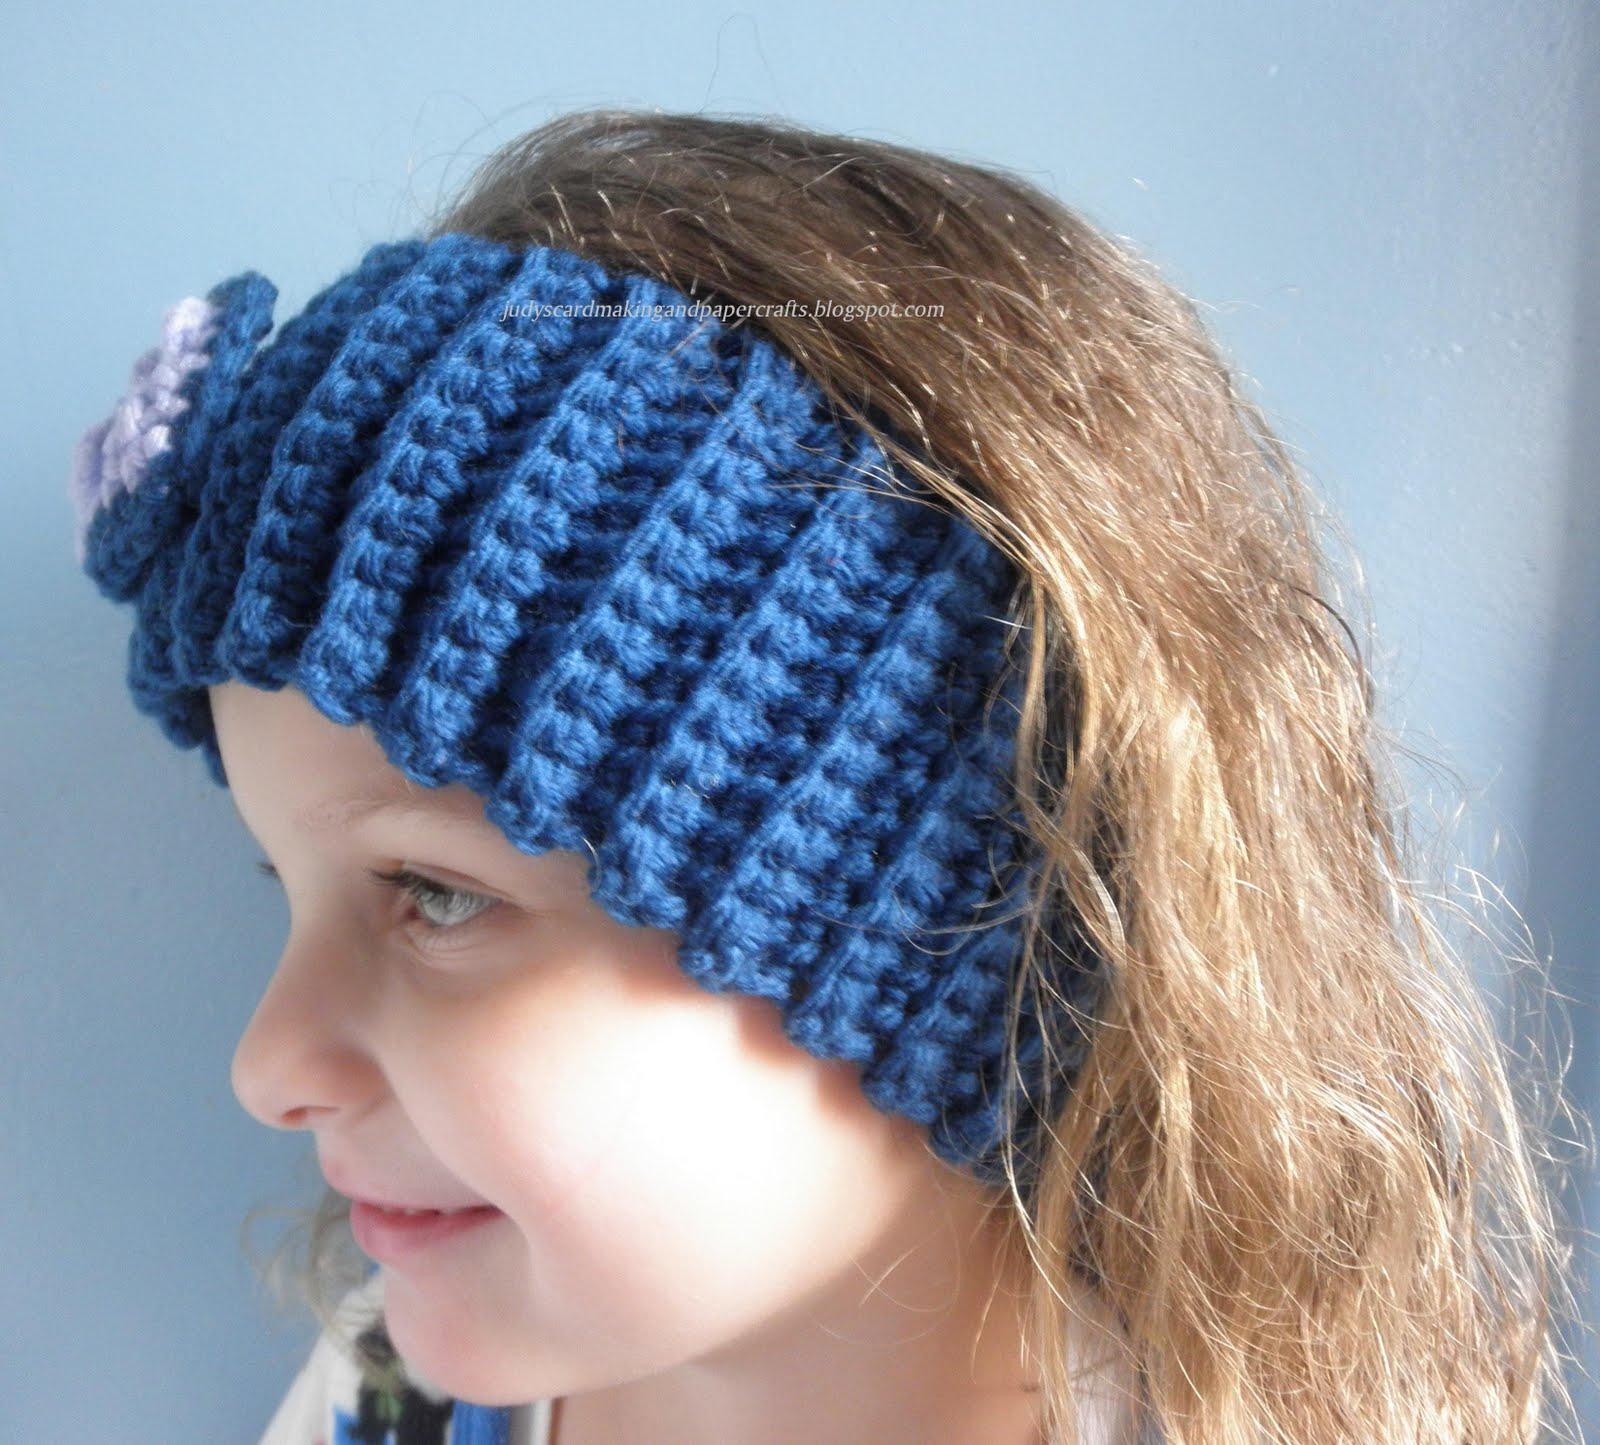 Judys Handmade Creations: Crocheted headband!